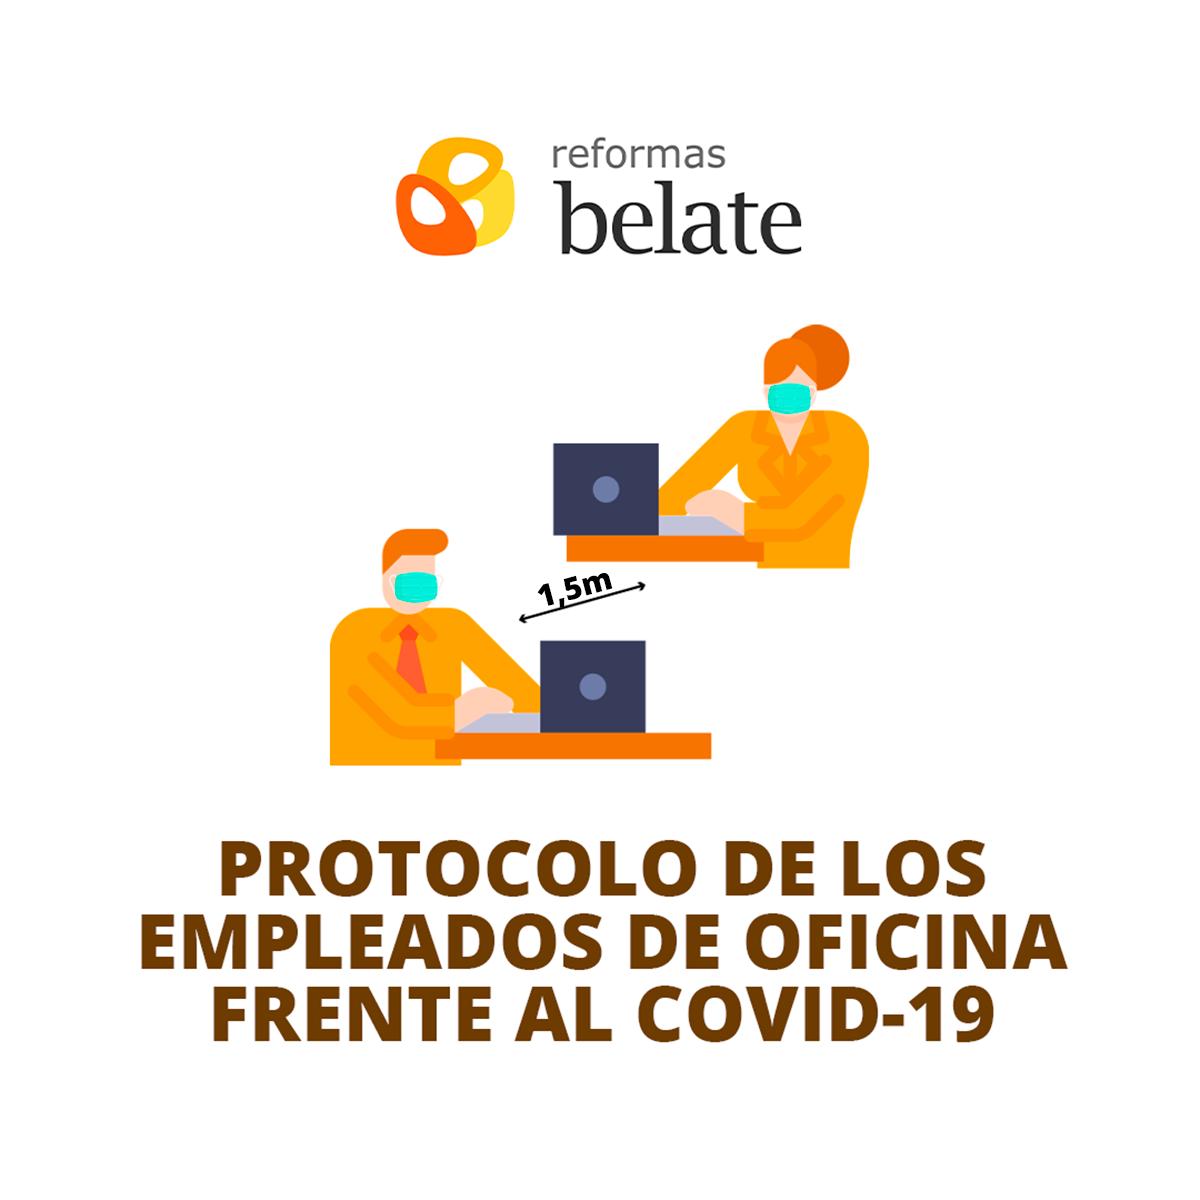 belate-protocol